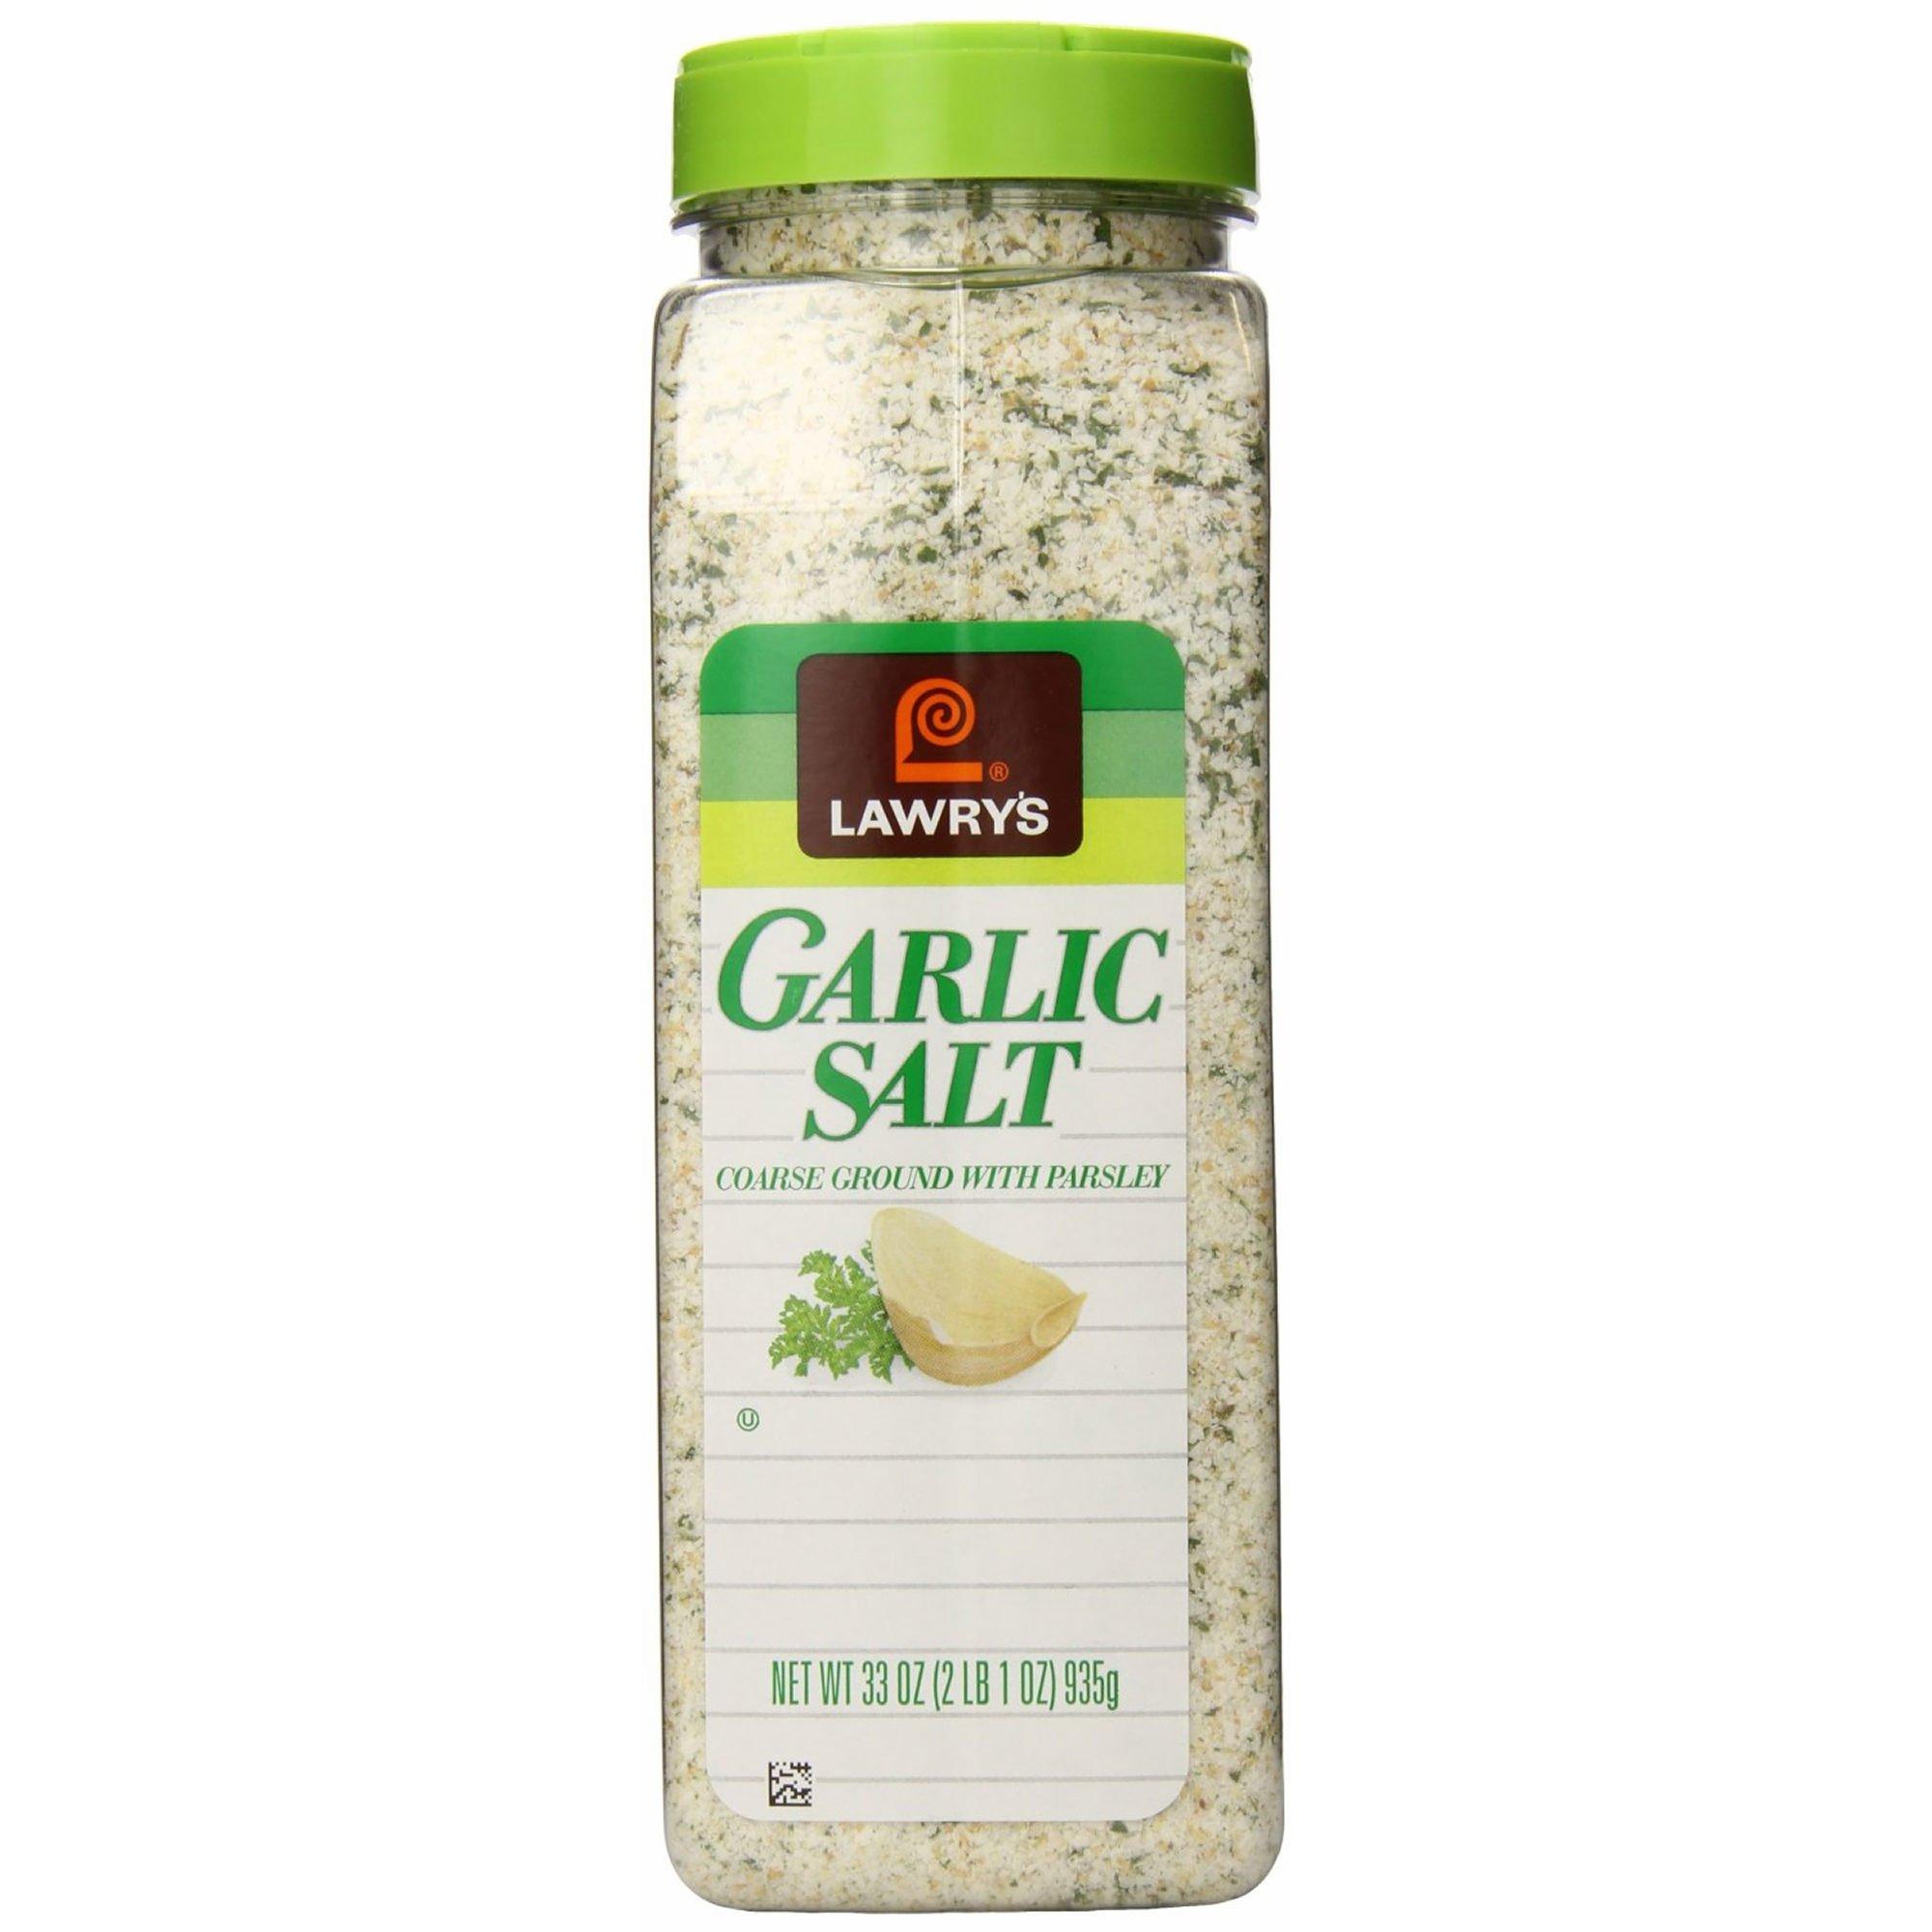 Lawry's Garlic Salt, 33 oz. (pack of 2)